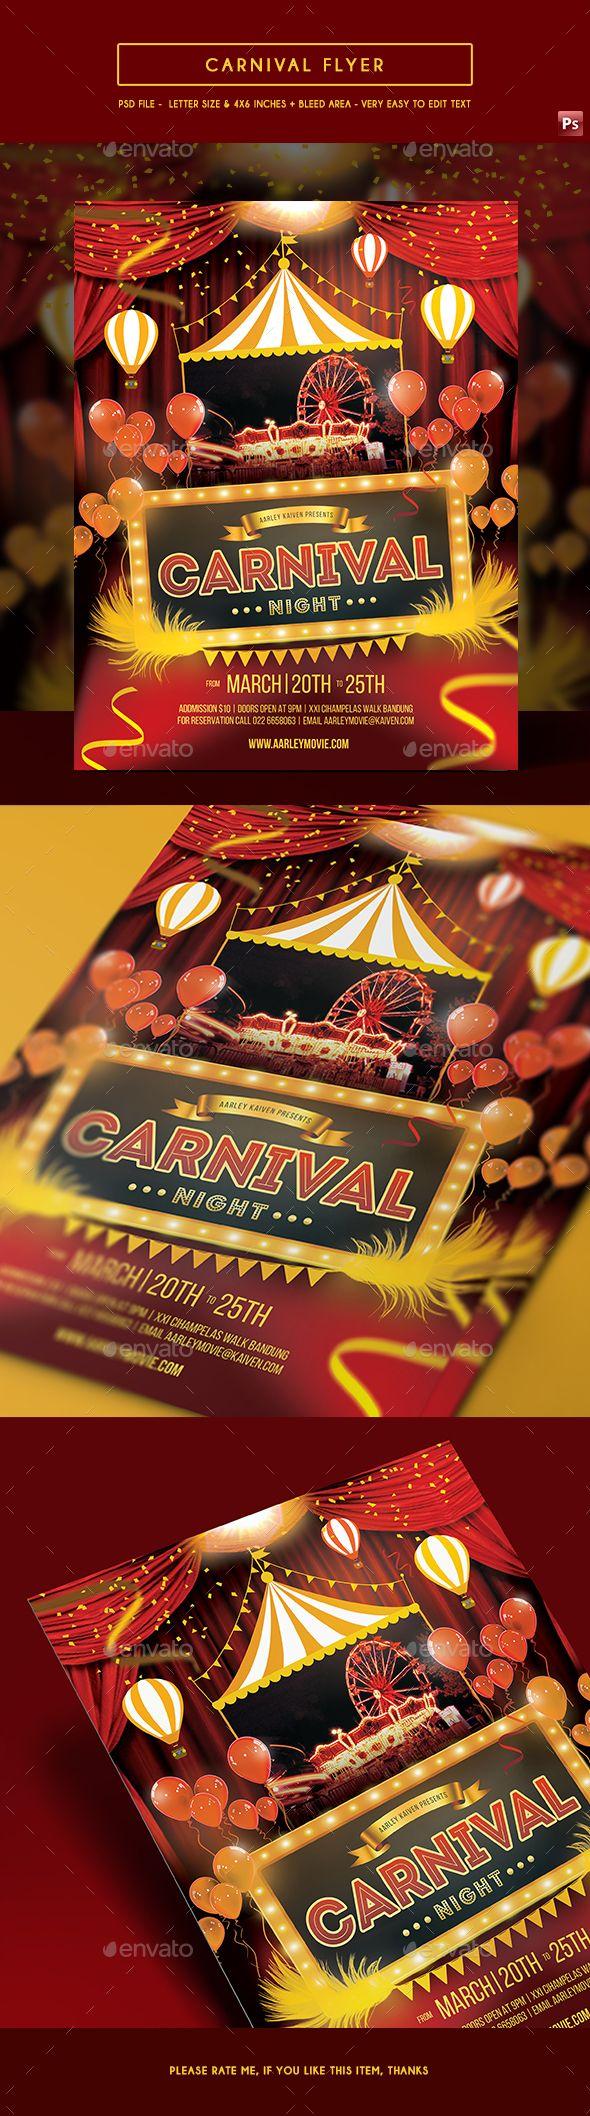 Carnival Flyer | Pinterest | Paisajes